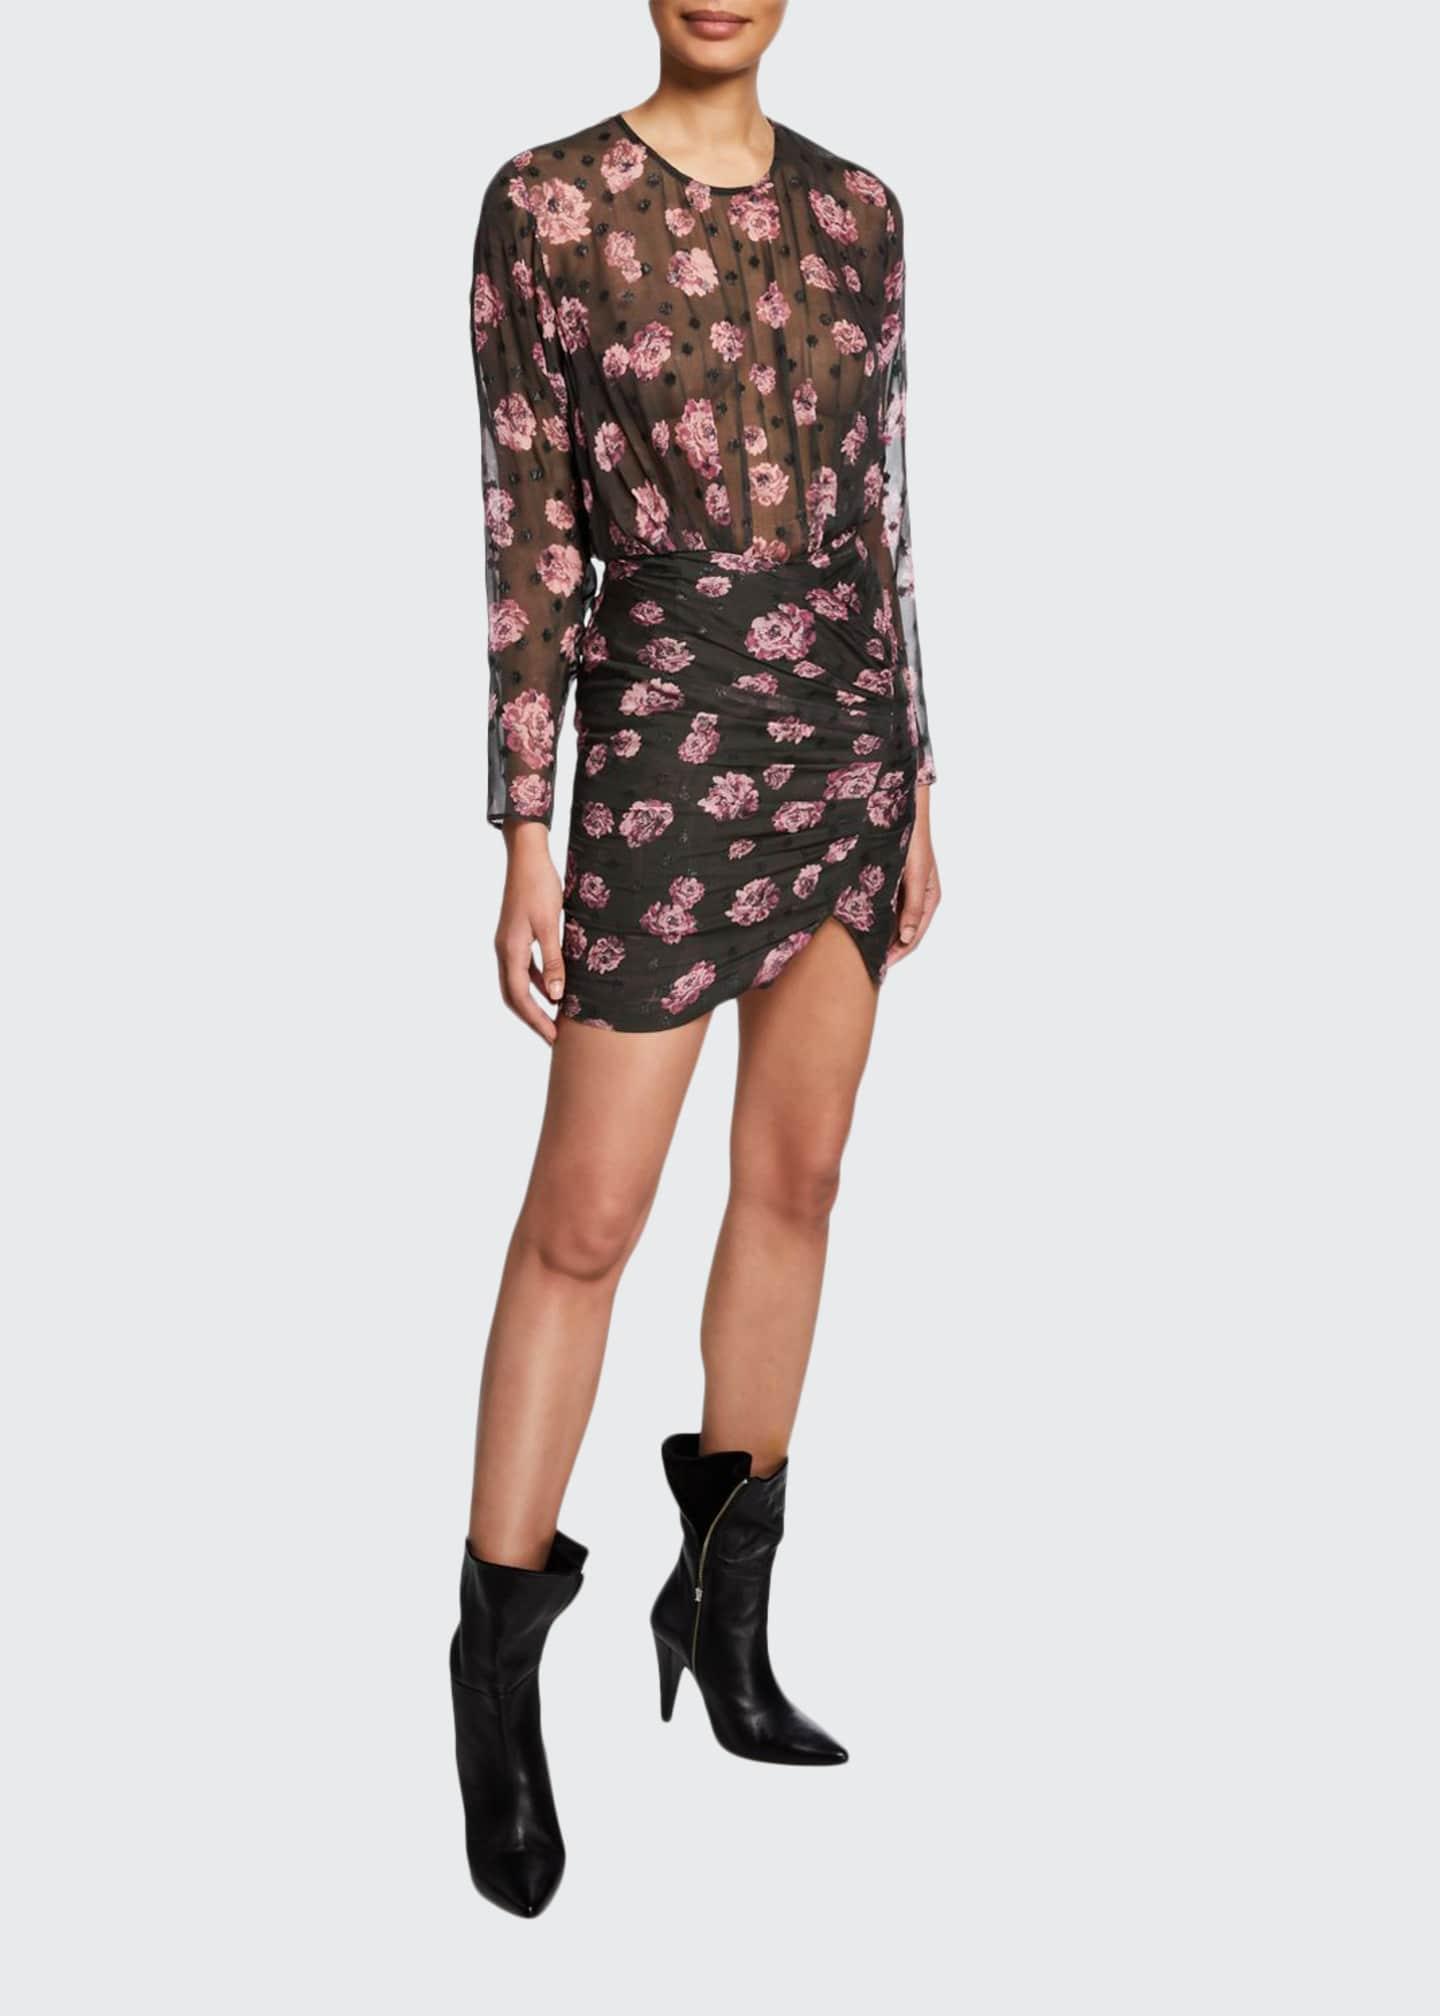 Iro Adelino Dotted Floral Long-Sleeve Mini Dress